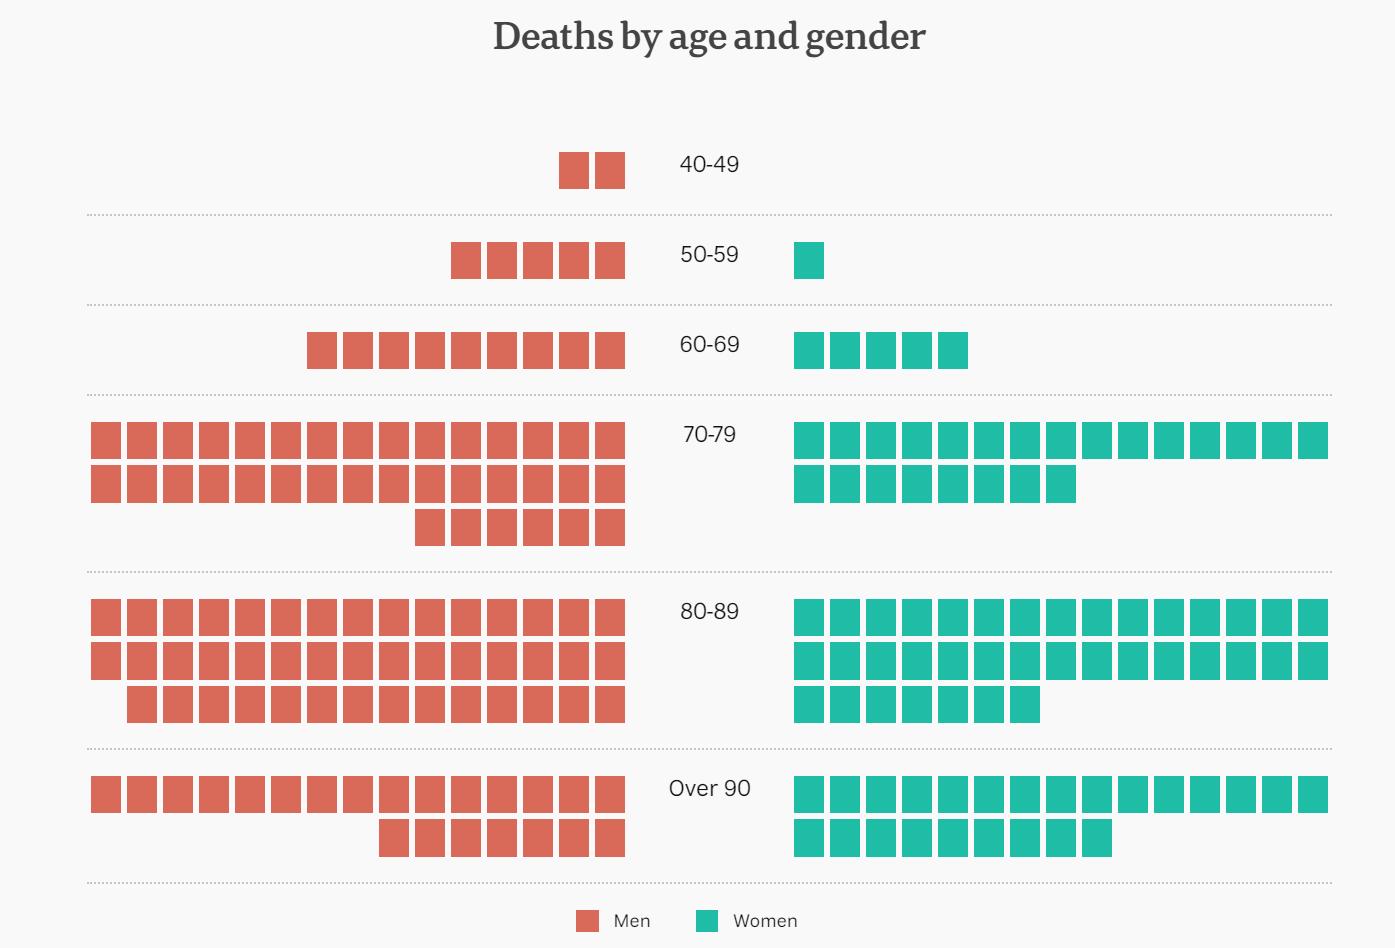 CV19 Deaths